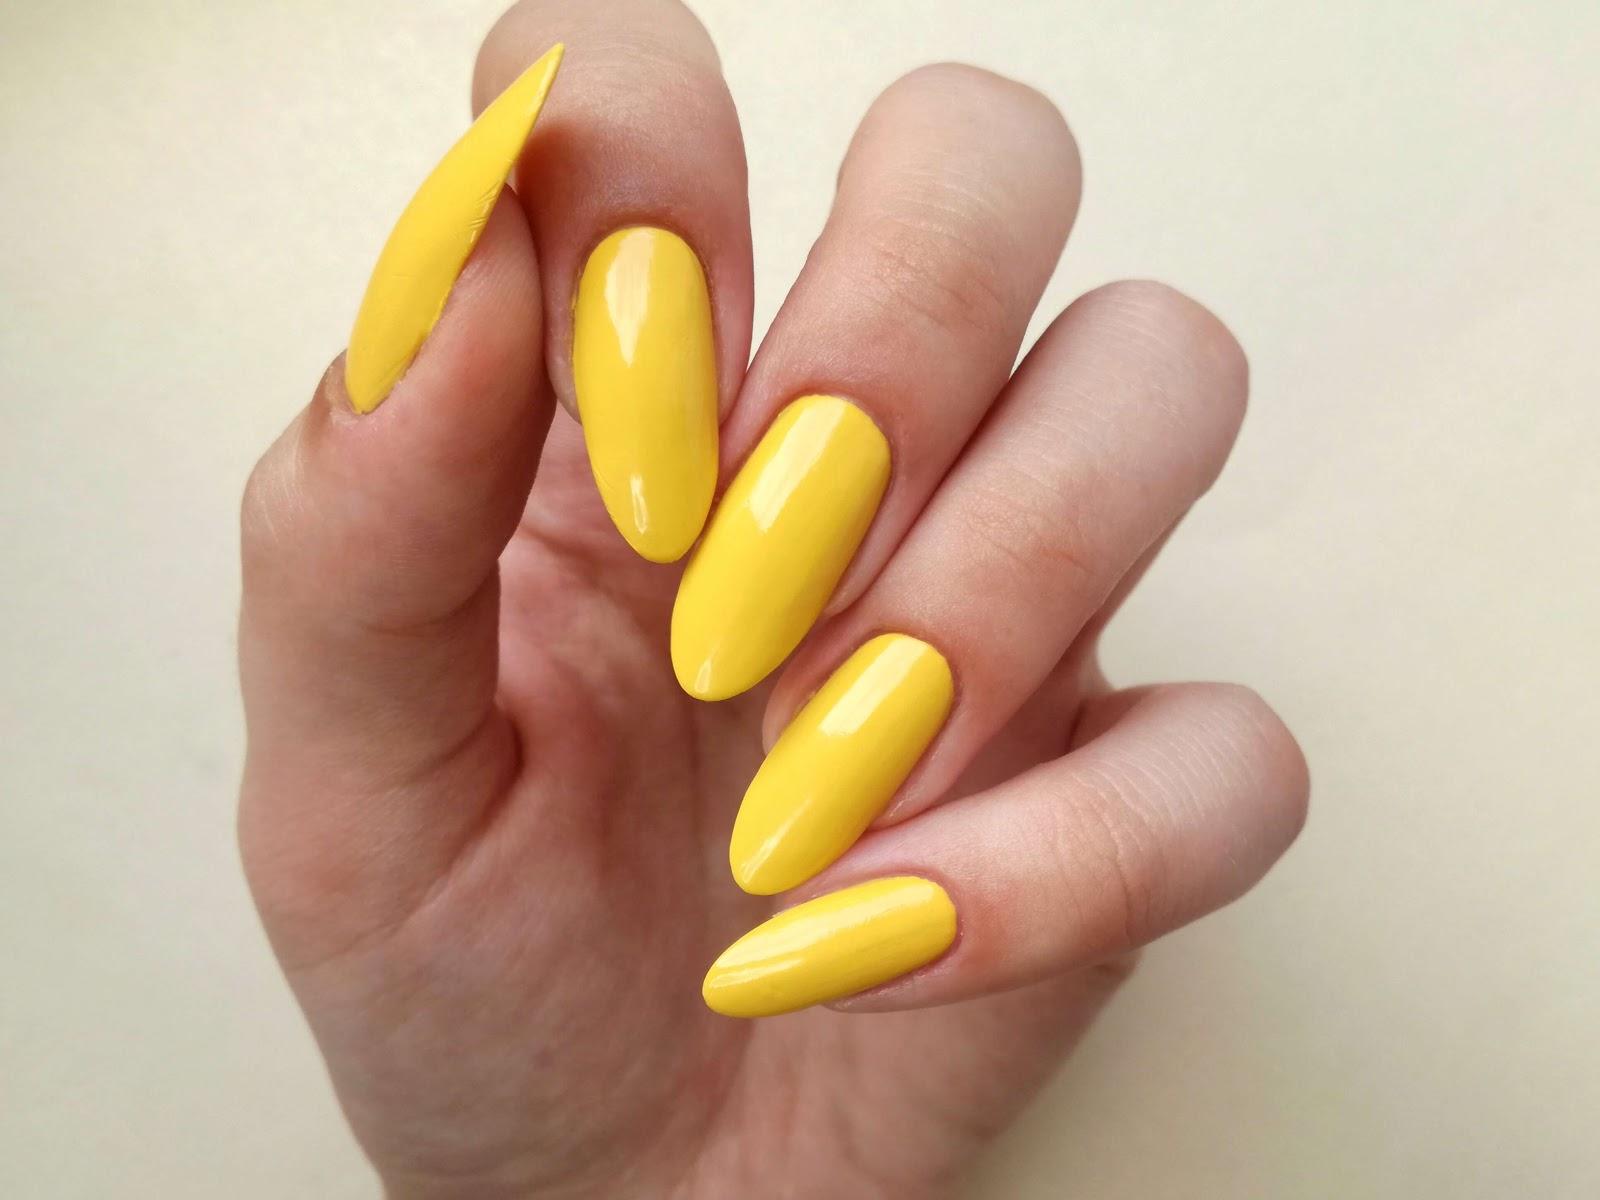 lakier wycon giallo swatch